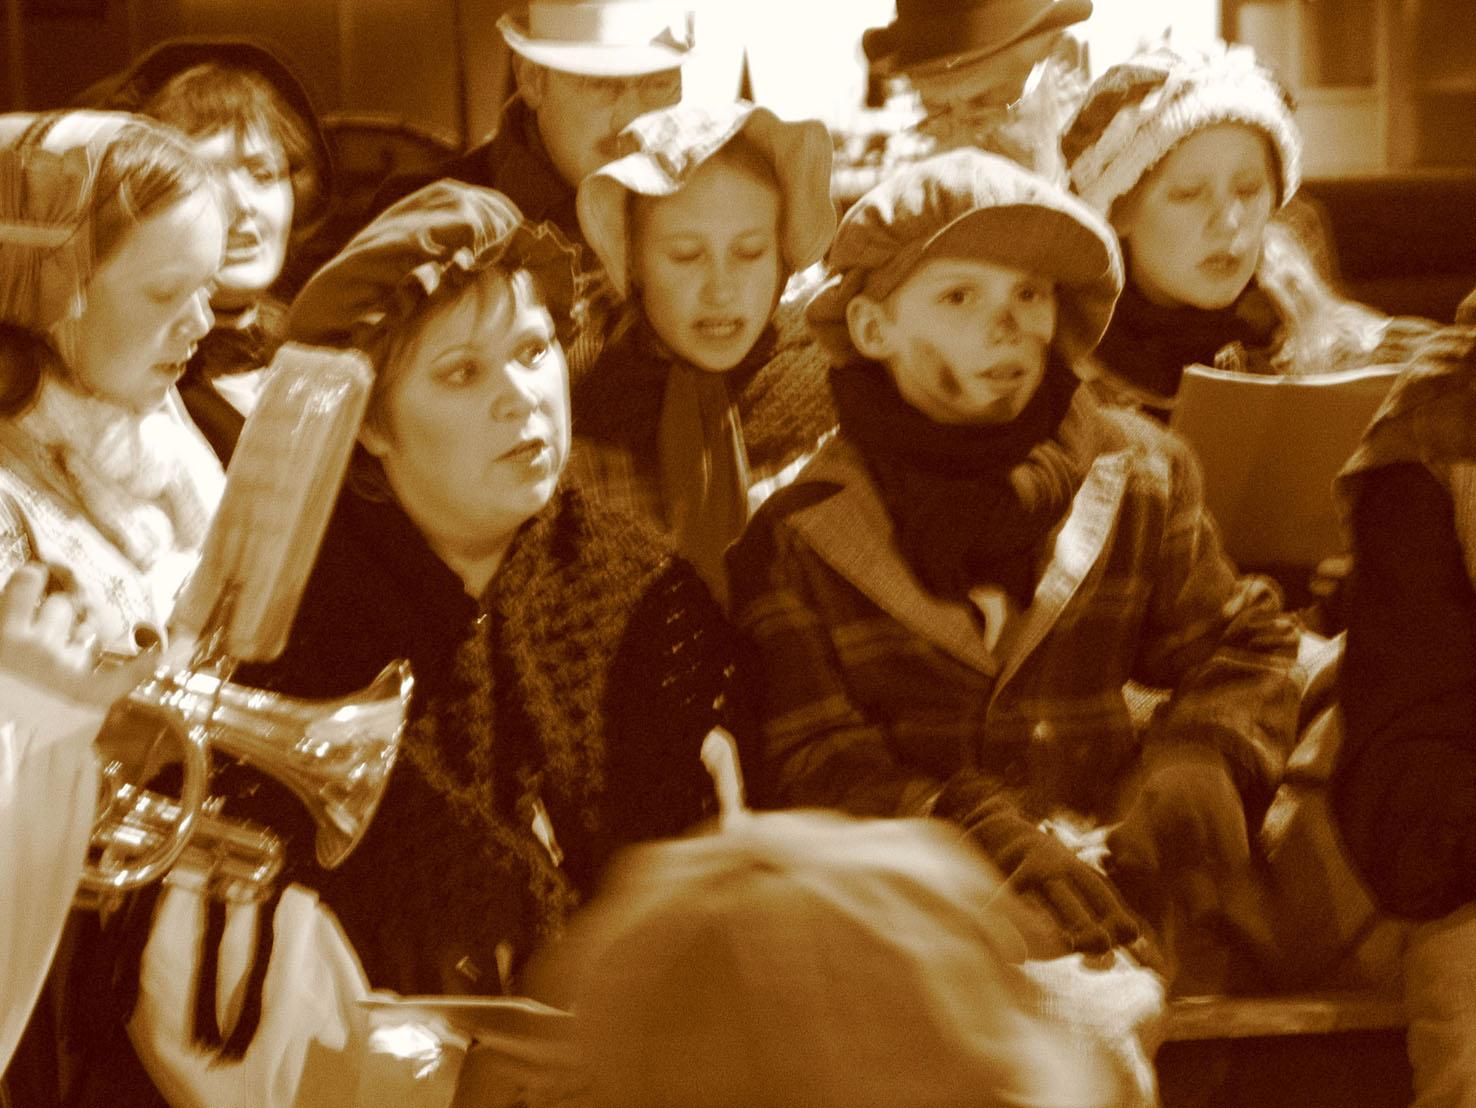 112 - Kerstmarkt Helmond 2003.jpg